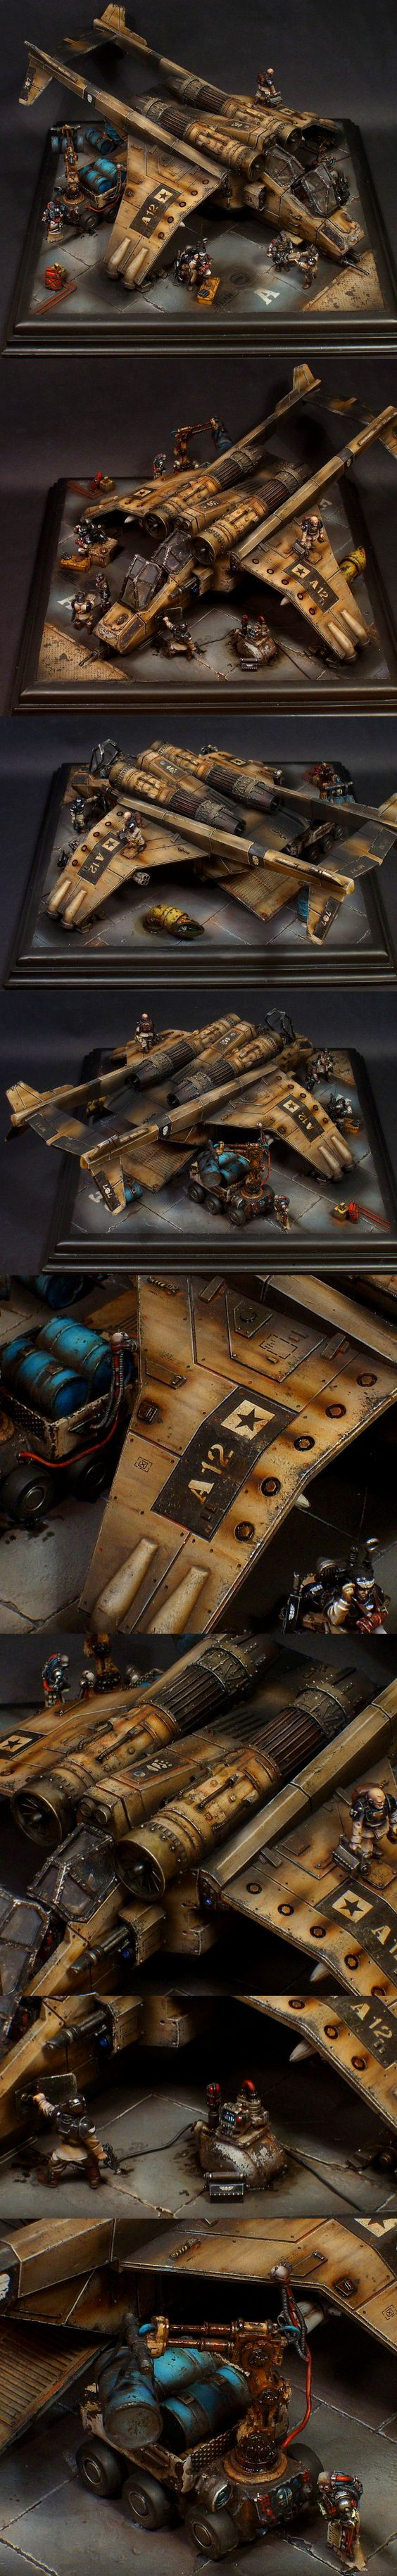 Warhammer 40k Aerobase Diorama, Astra Militarum Valkyrie with repair crew